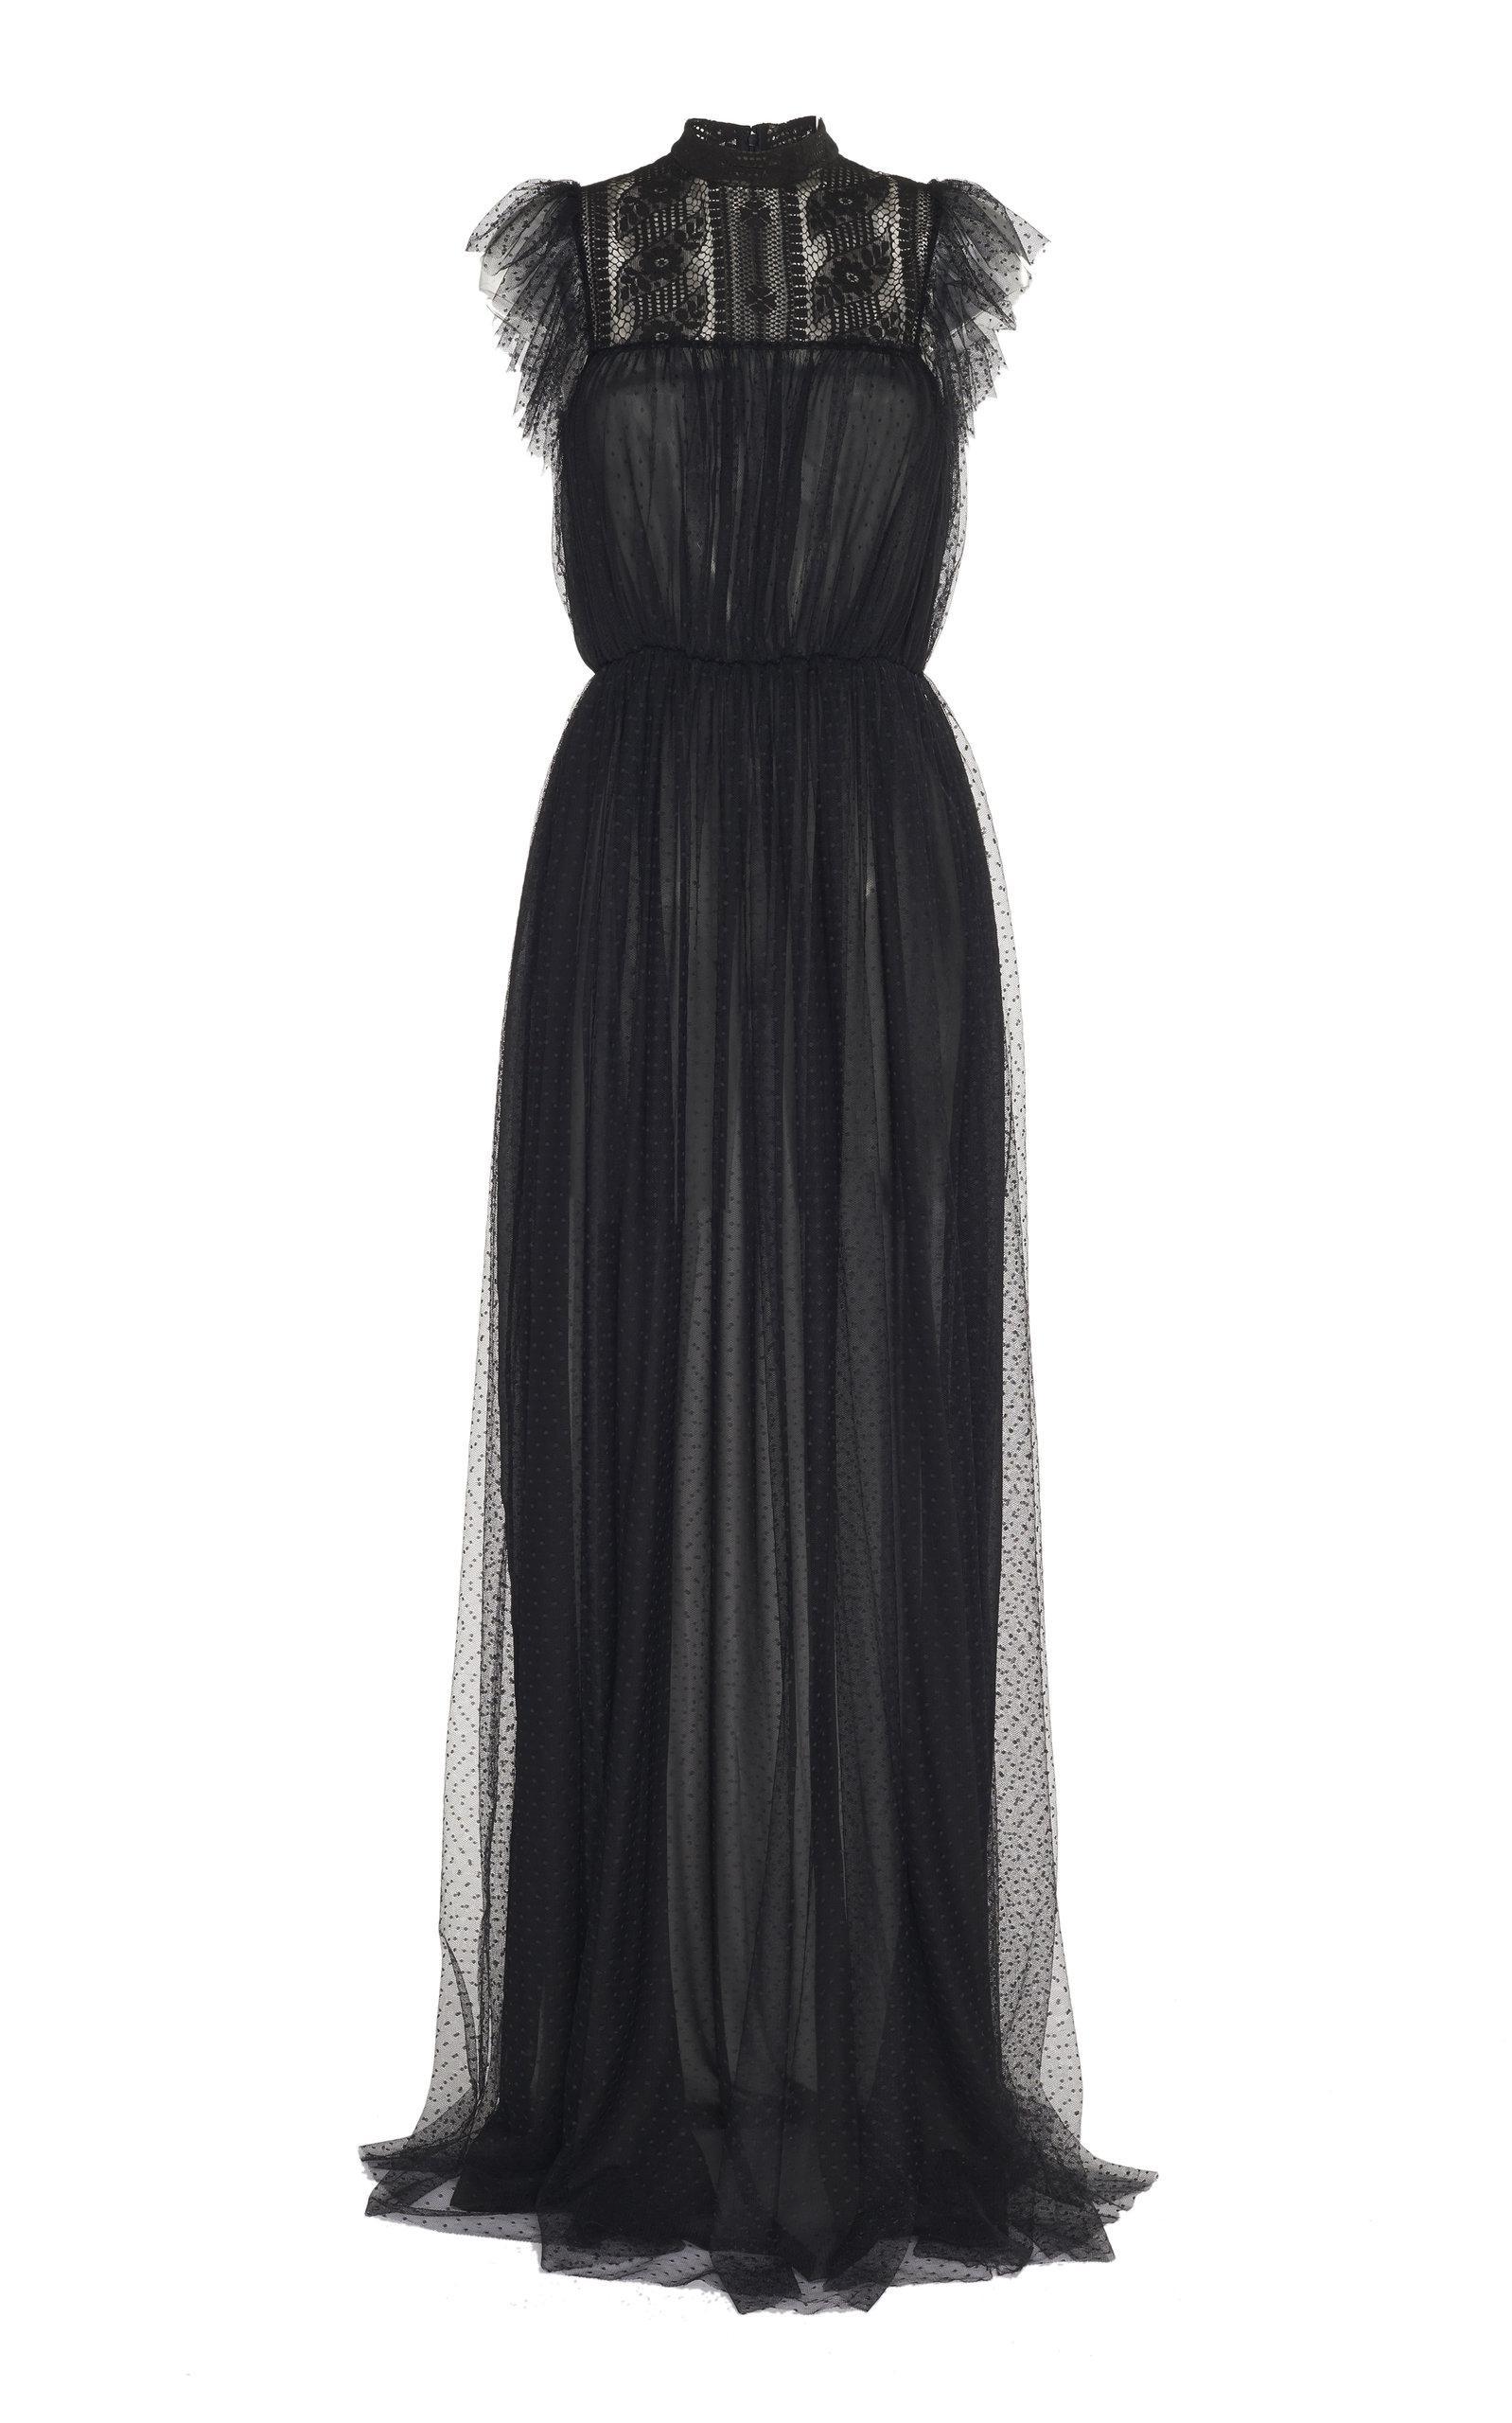 fe98952ab2 Lyst - Giambattista Valli Ruffle Maxi Dress in Black